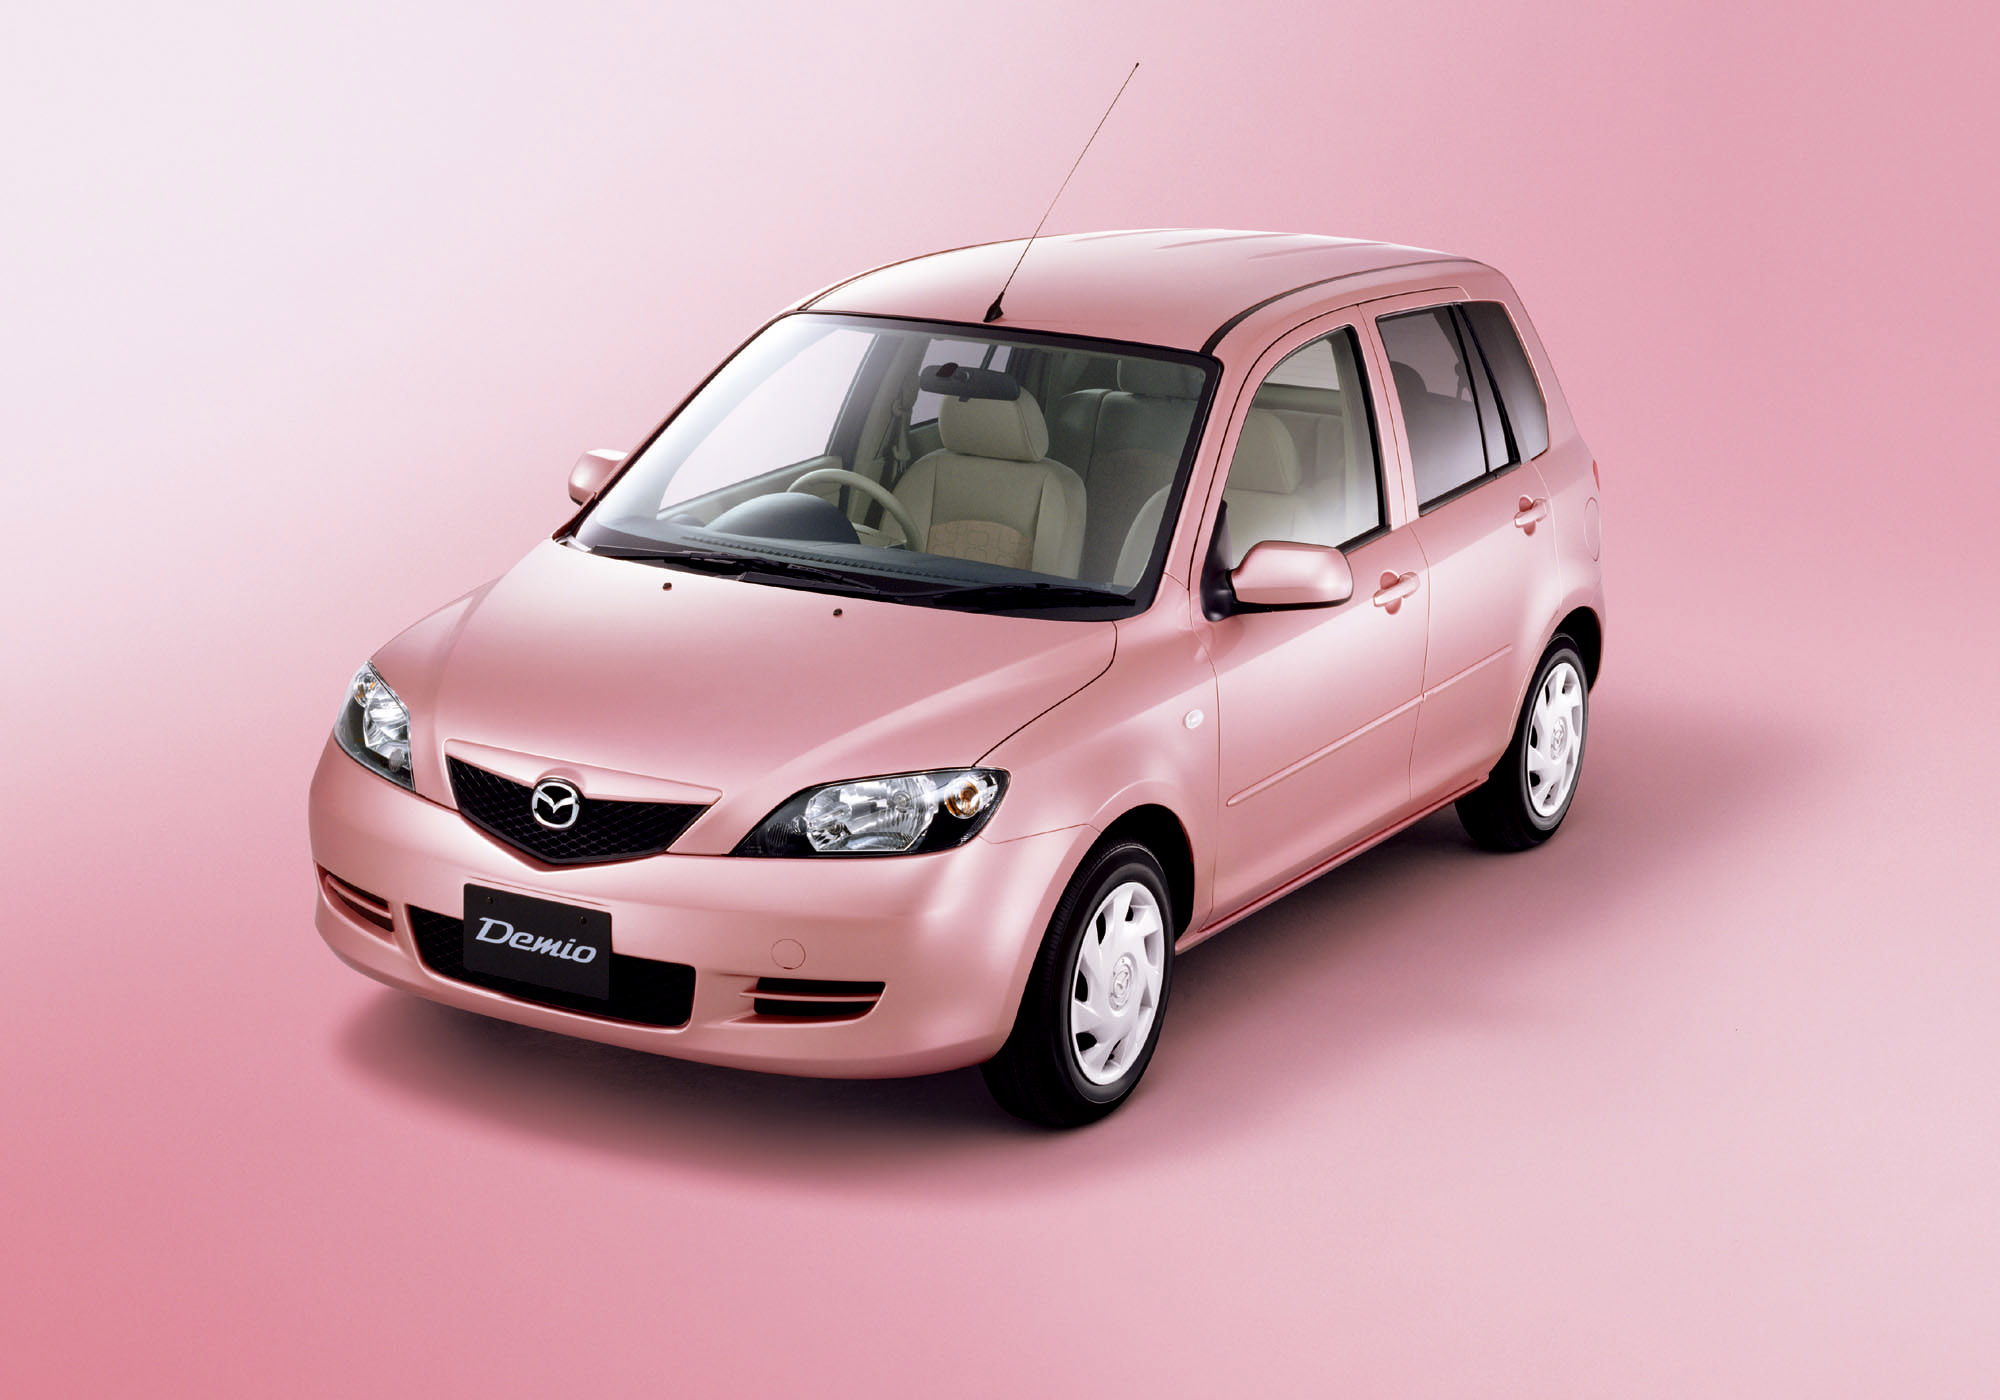 Mazda ltd 28 images mazda mx 5 sport black limited edition mazda publicscrutiny Gallery